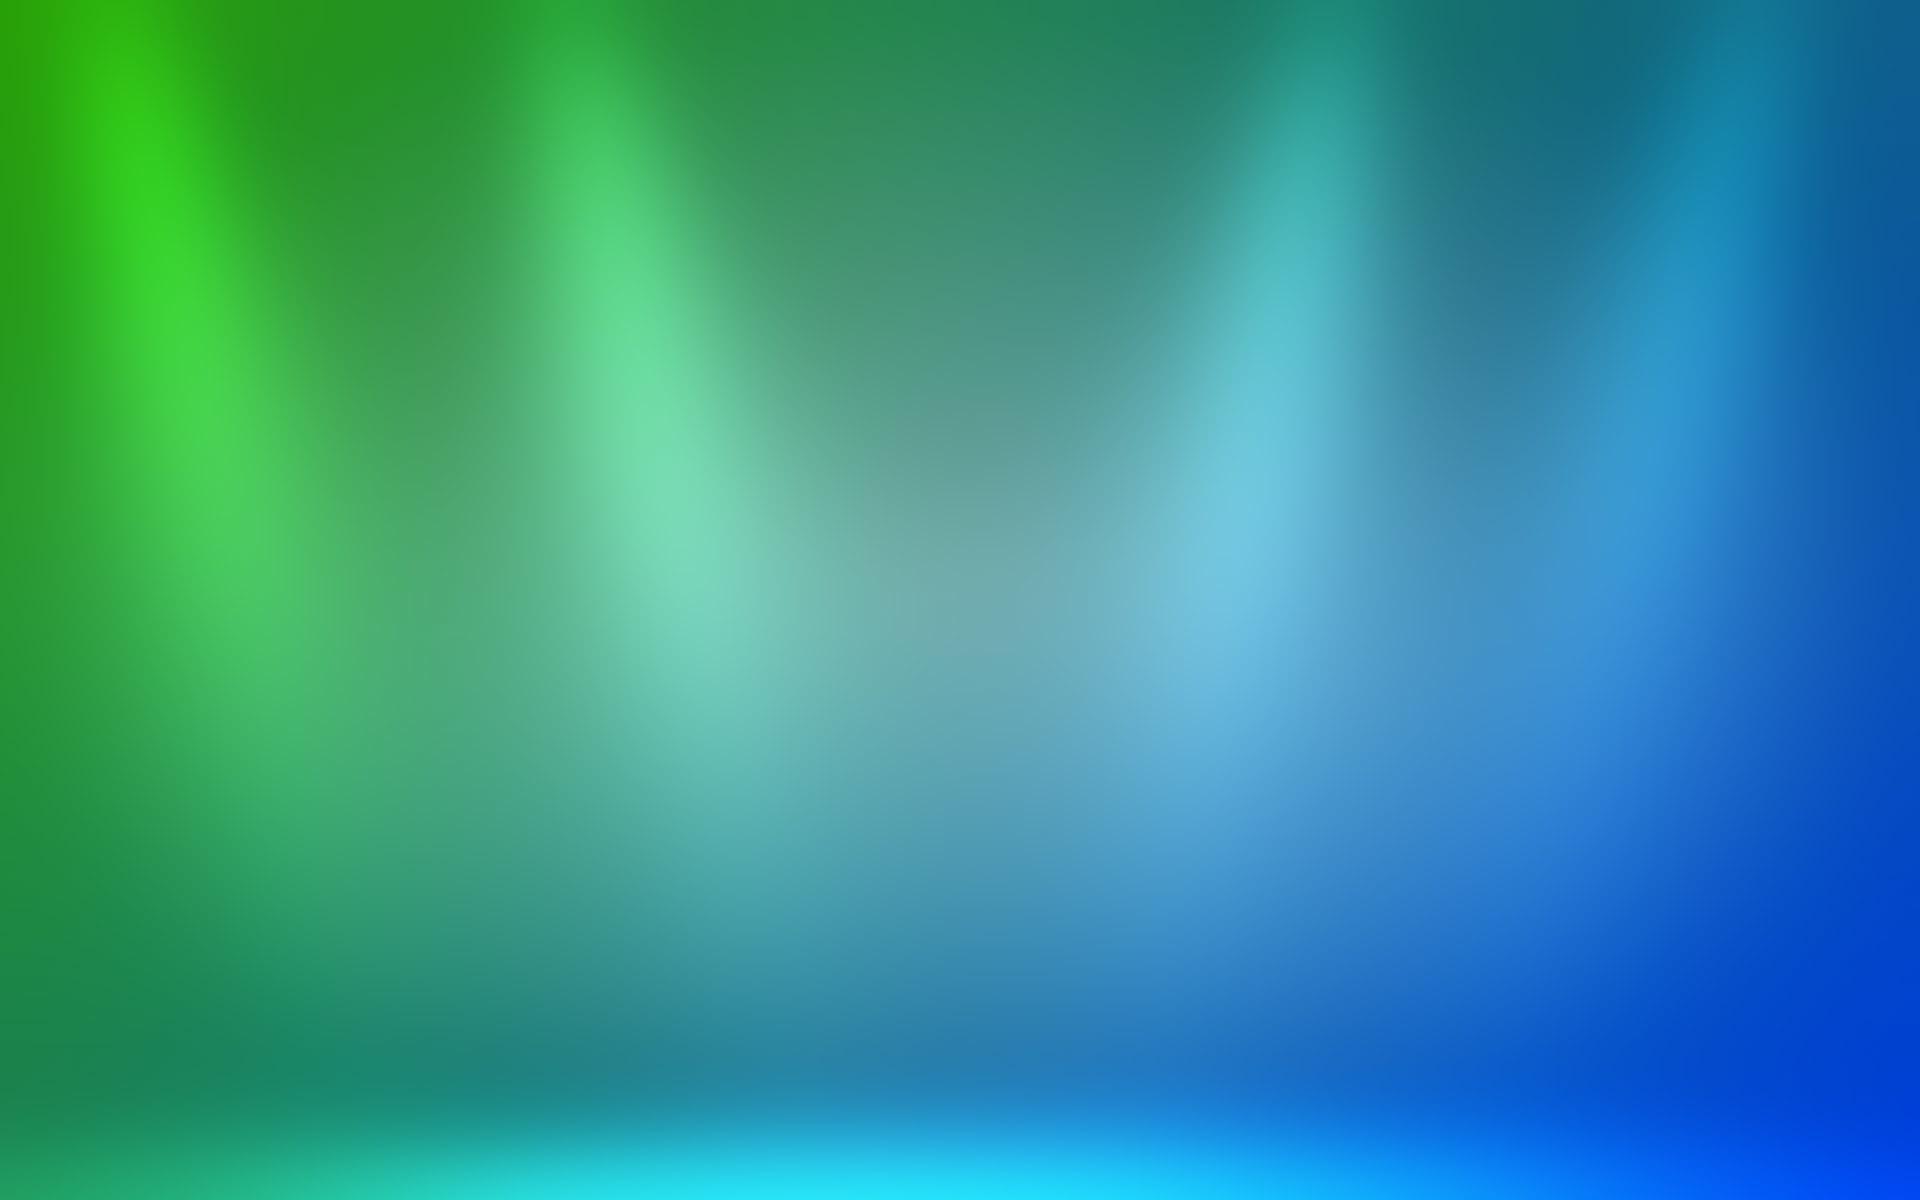 Cute Blue Stripes Wallpaper